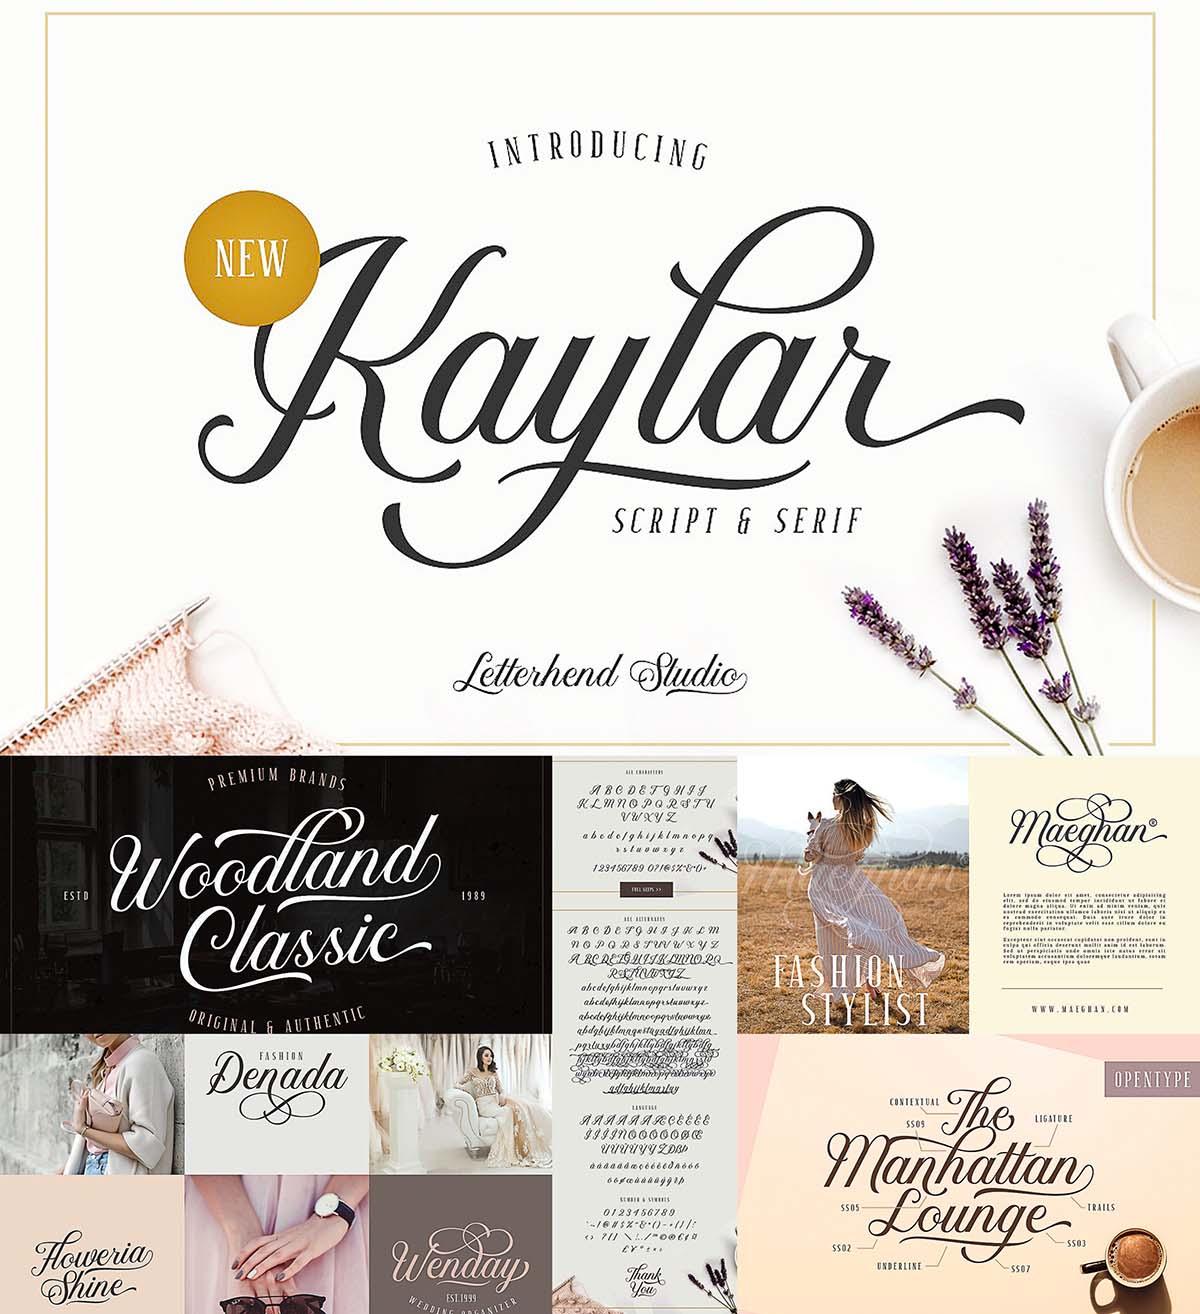 Kaylar Elegant Script Serif